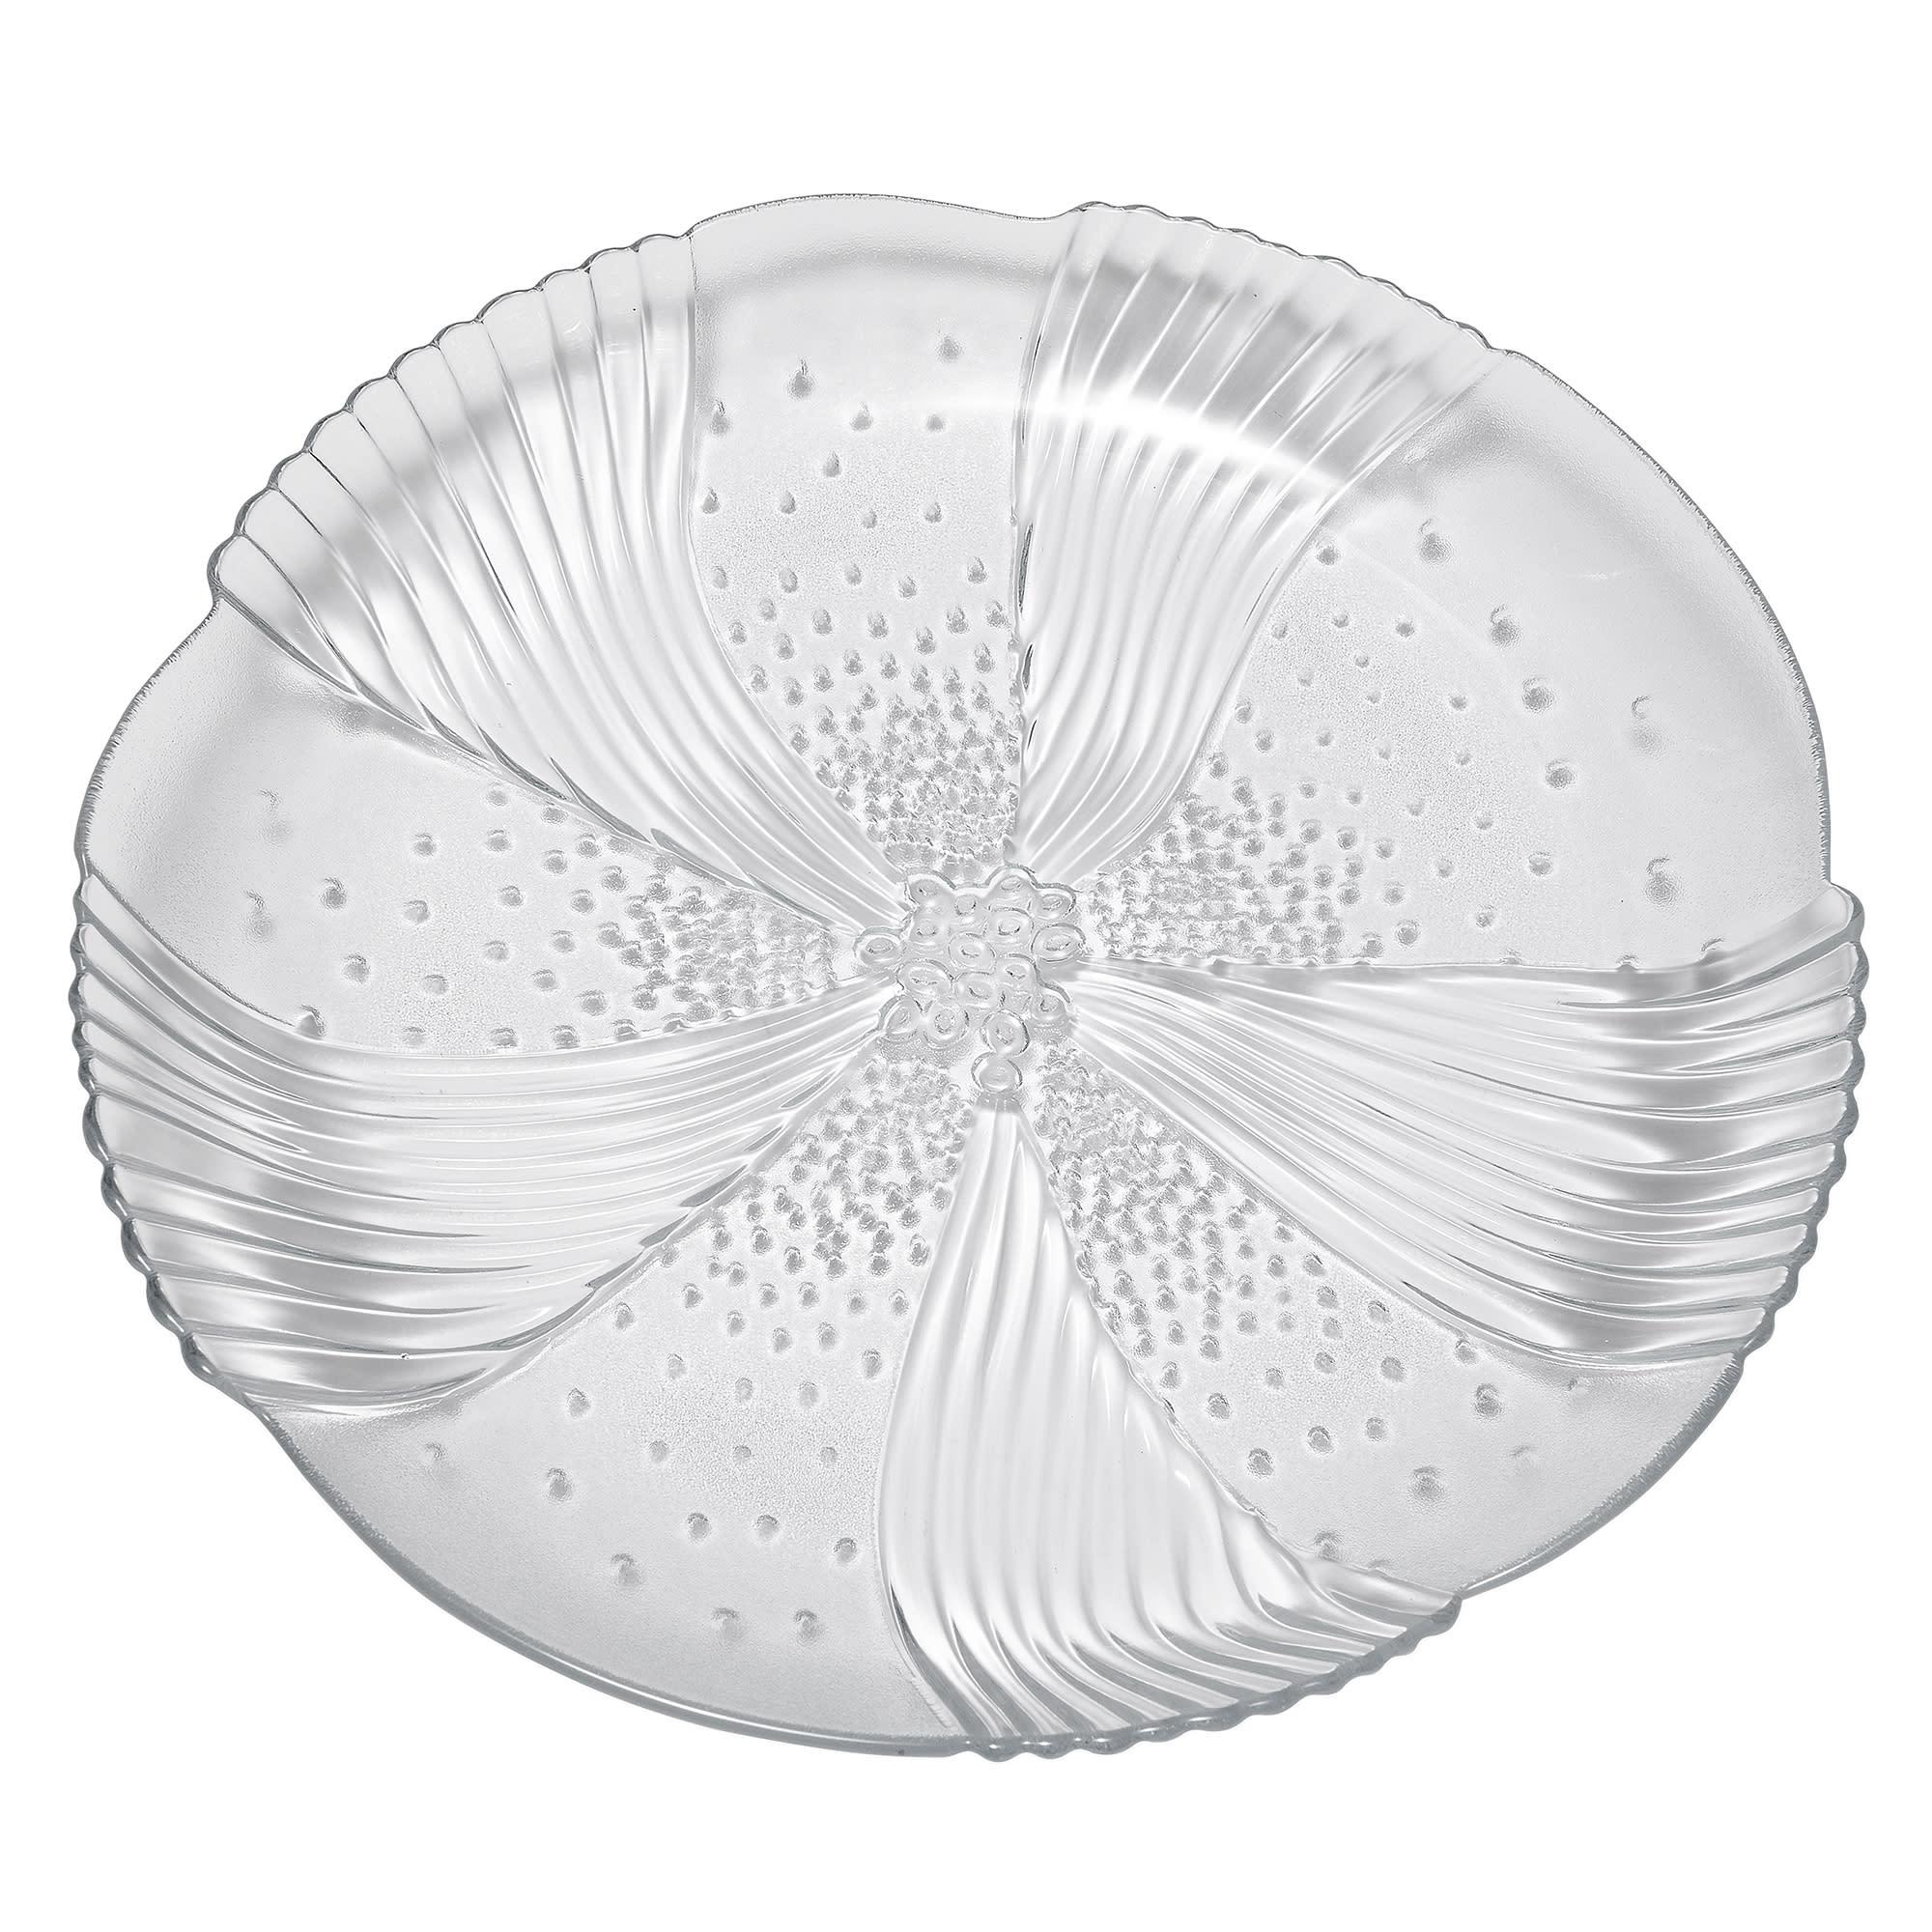 "Libbey 15506 7.58"" DuraTuff Harmony Glass Salad Plate"